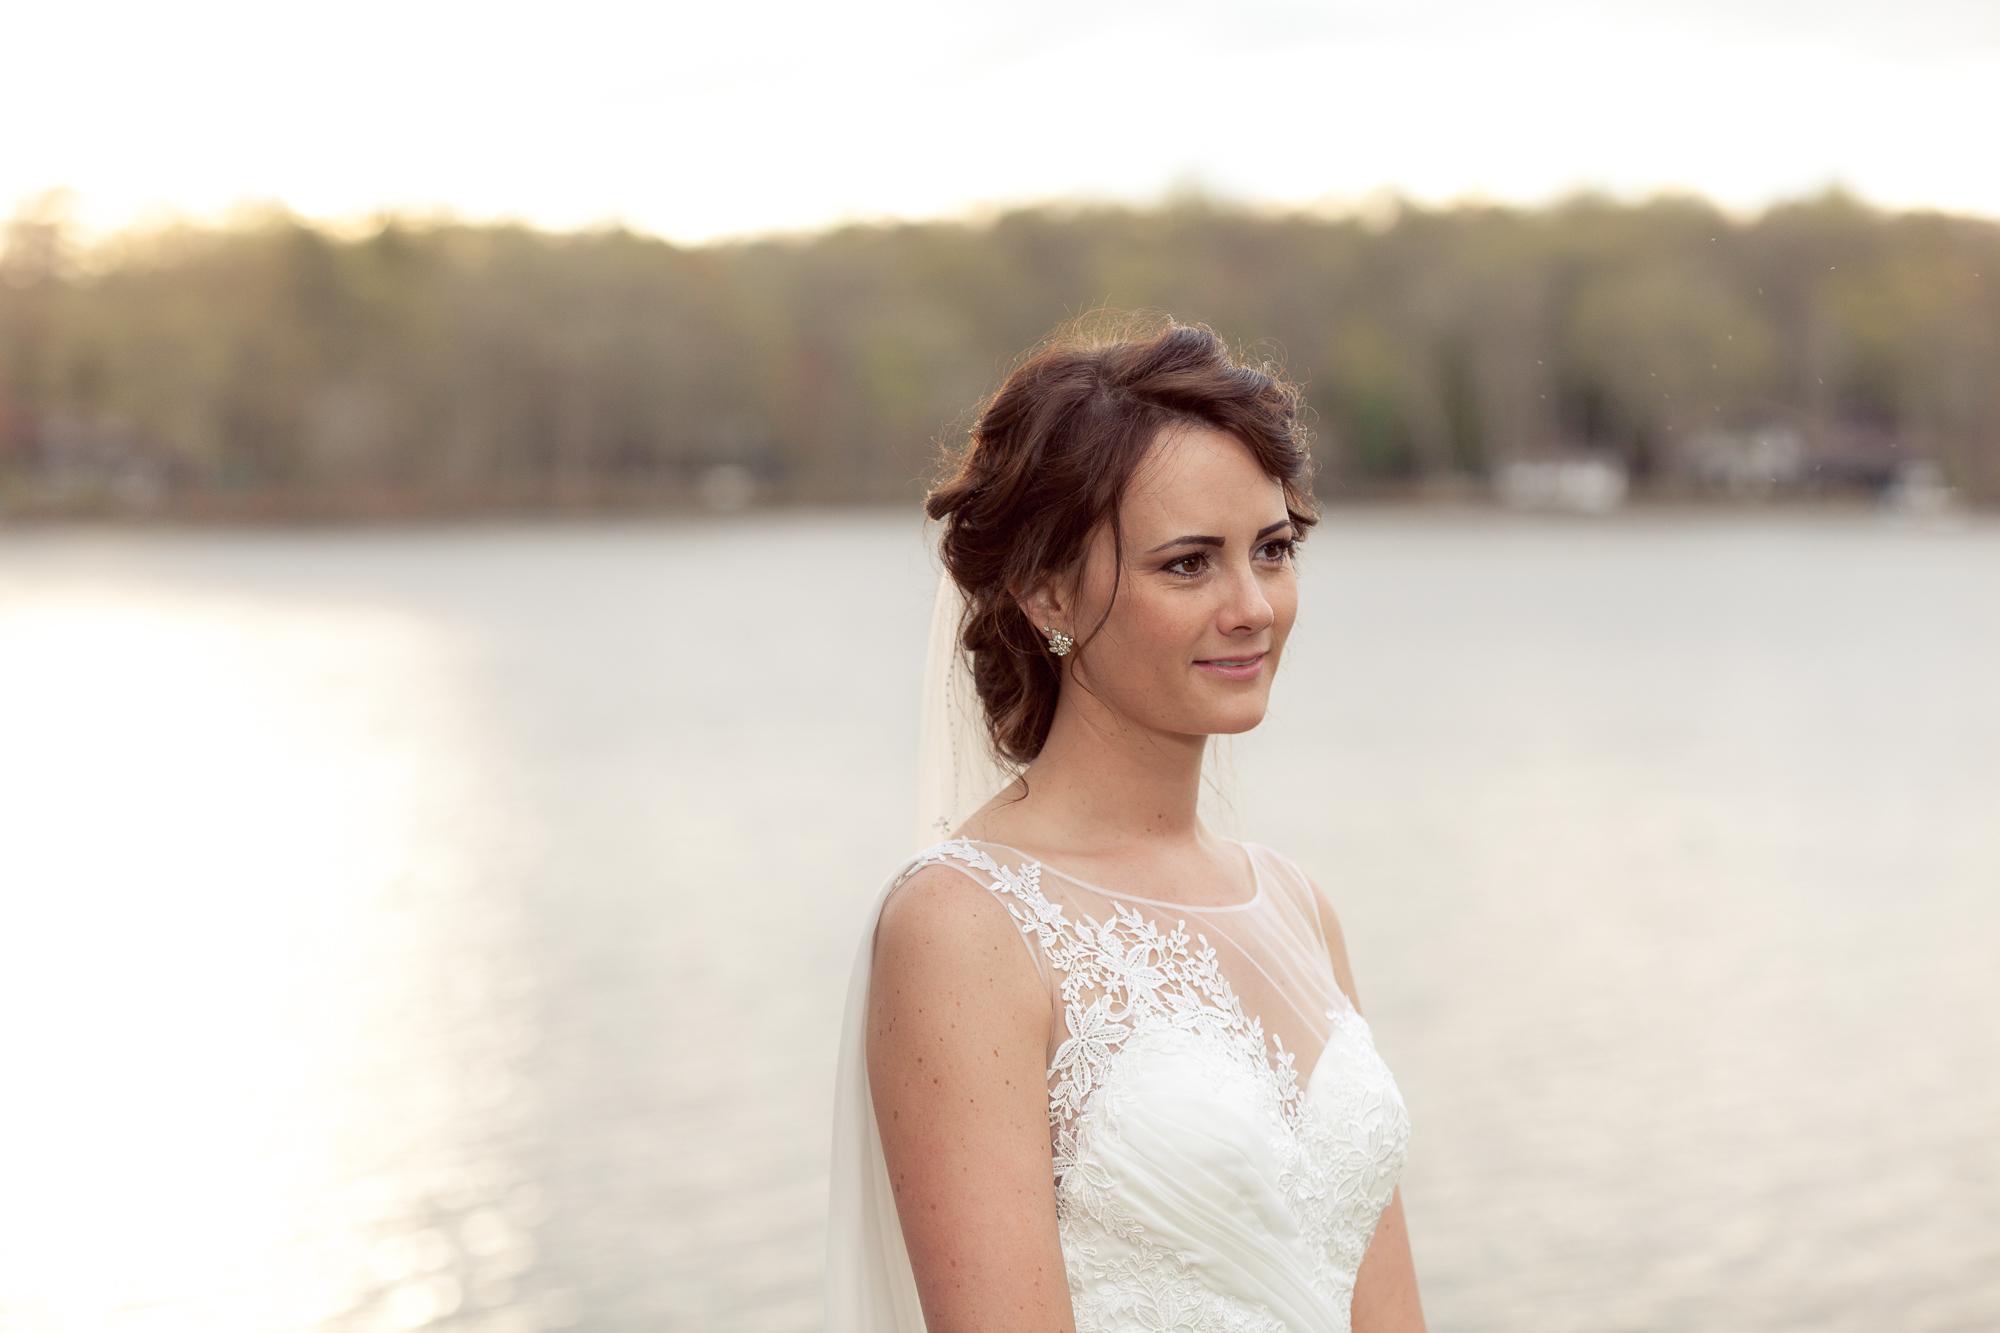 scranton-wedding-photography-zak-zavada-poconos--mattRachel-048.jpg